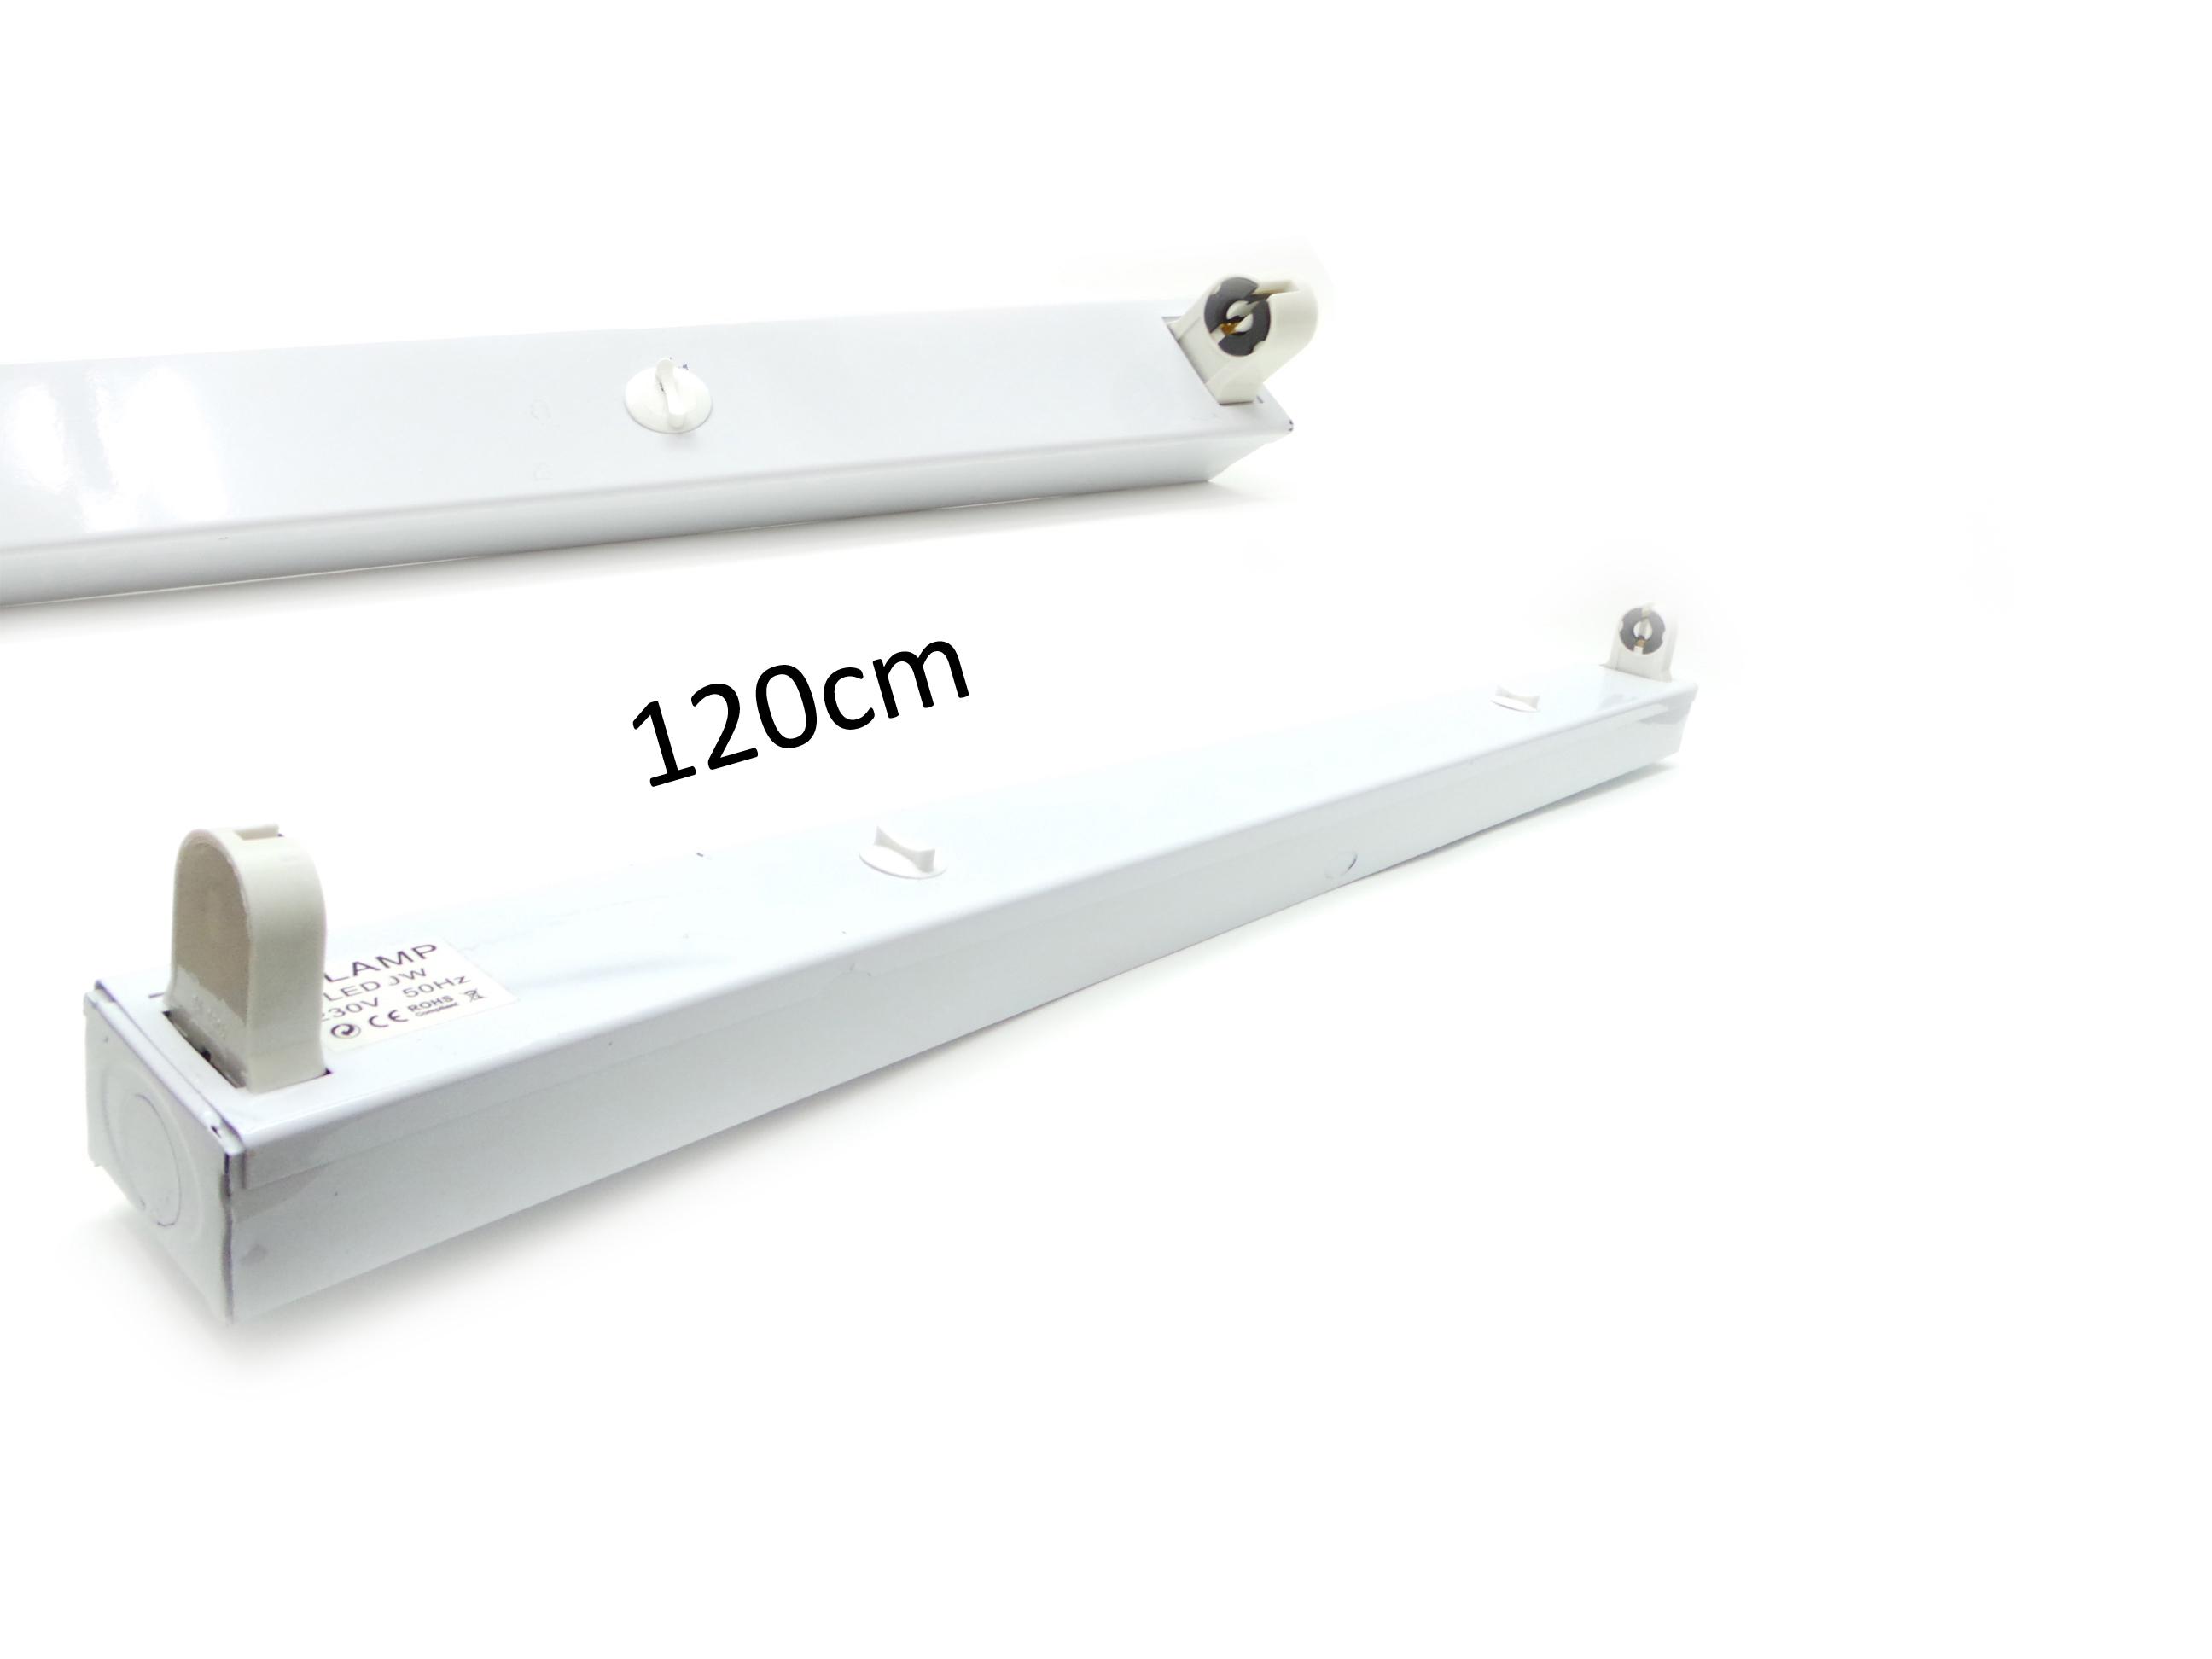 R2 120CM   Offerte plafoniere pannelli LED | SILAMP     Plafoniera